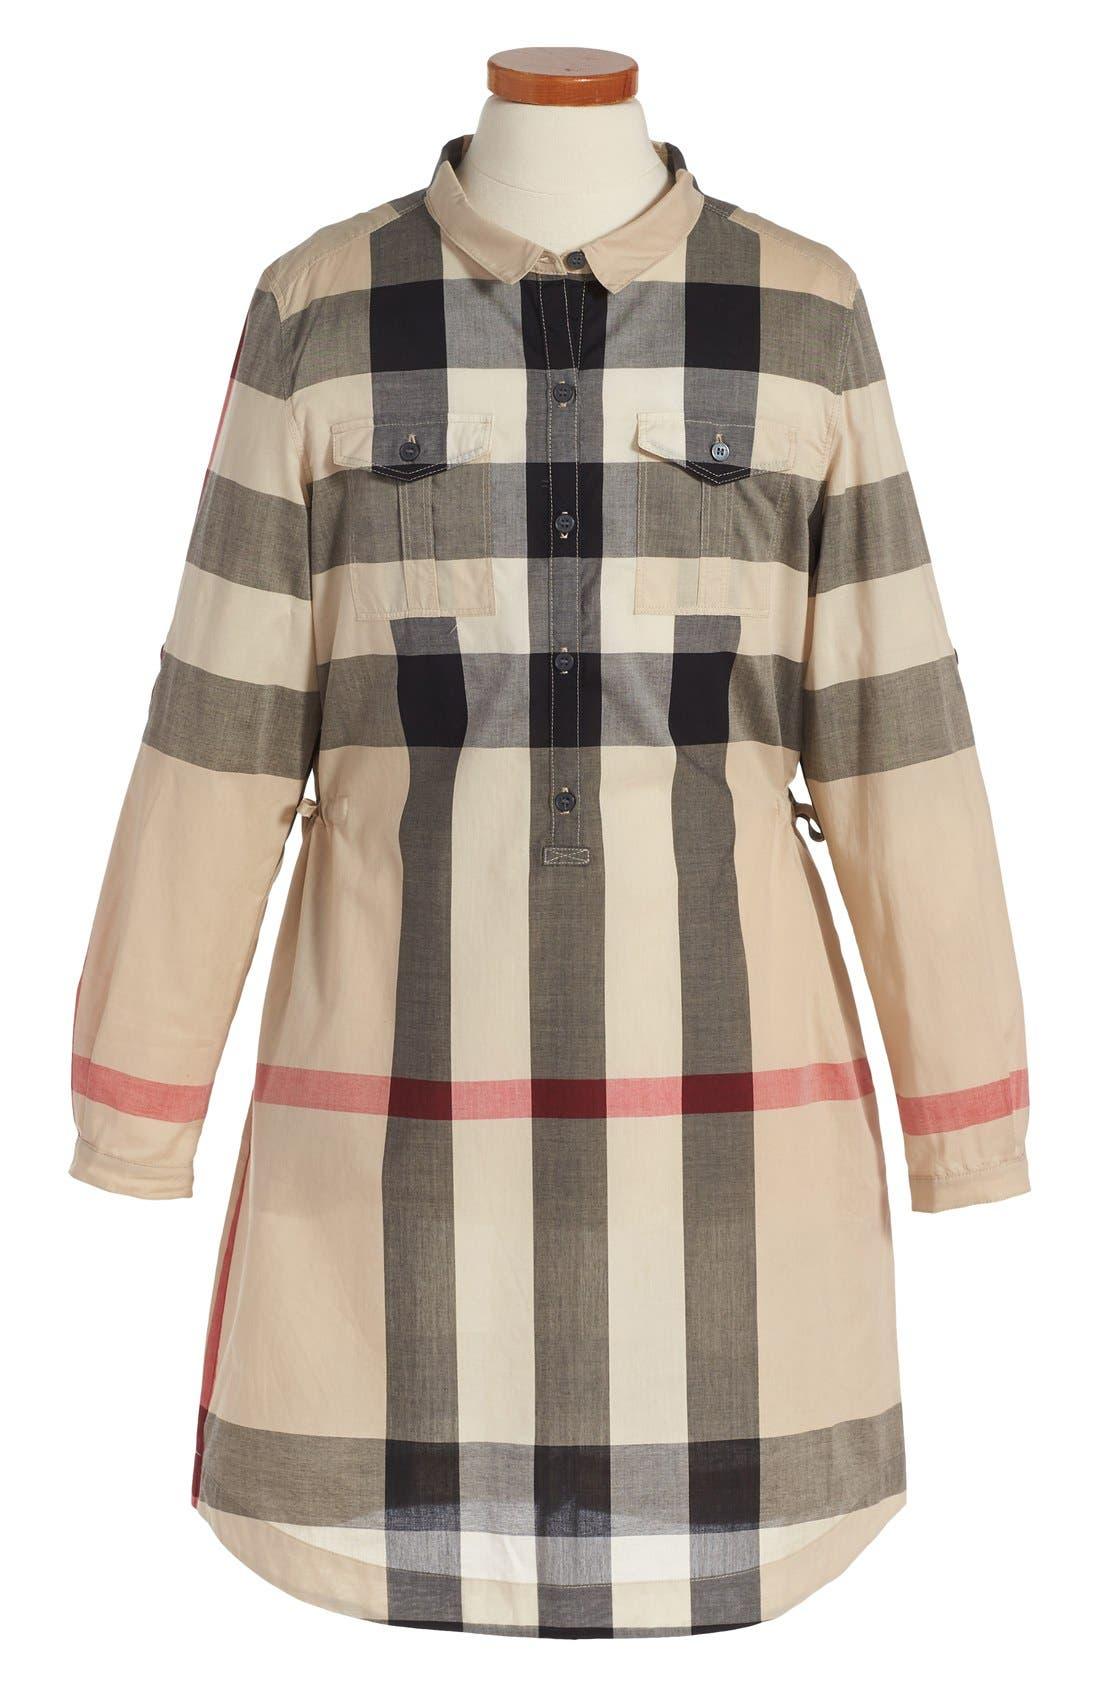 Alternate Image 1 Selected - Burberry 'Darielle' Check Print Dress (Little Girls & Big Girls)